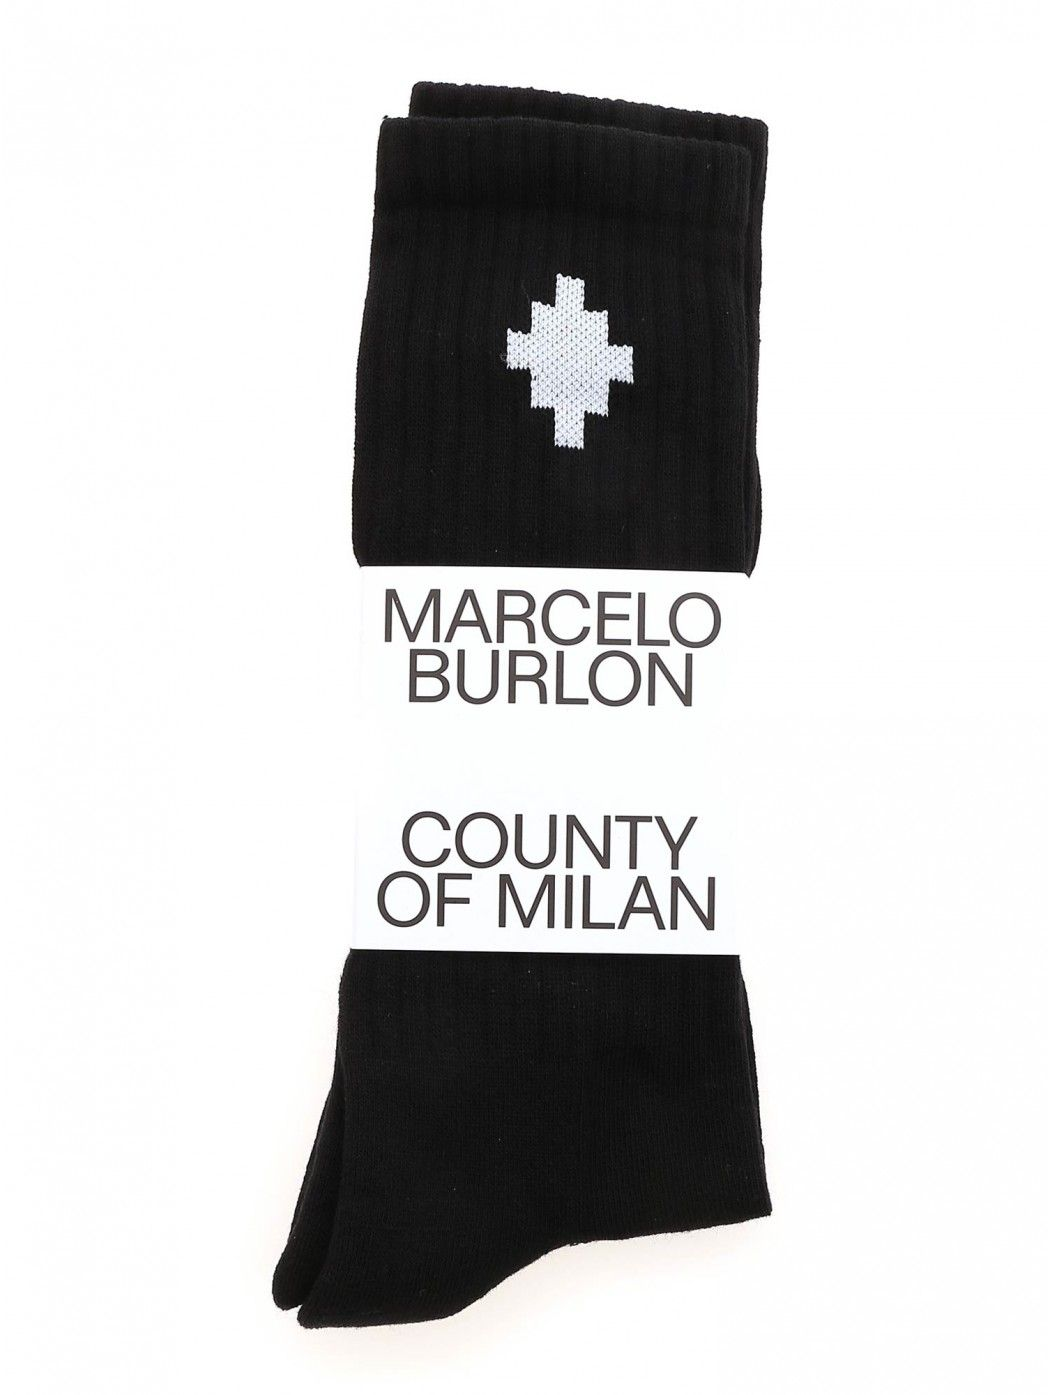 CROSS SIDEWAY MIDHIGH SOCKS MARCELO BURLON CMRA010F21KNI001 1001